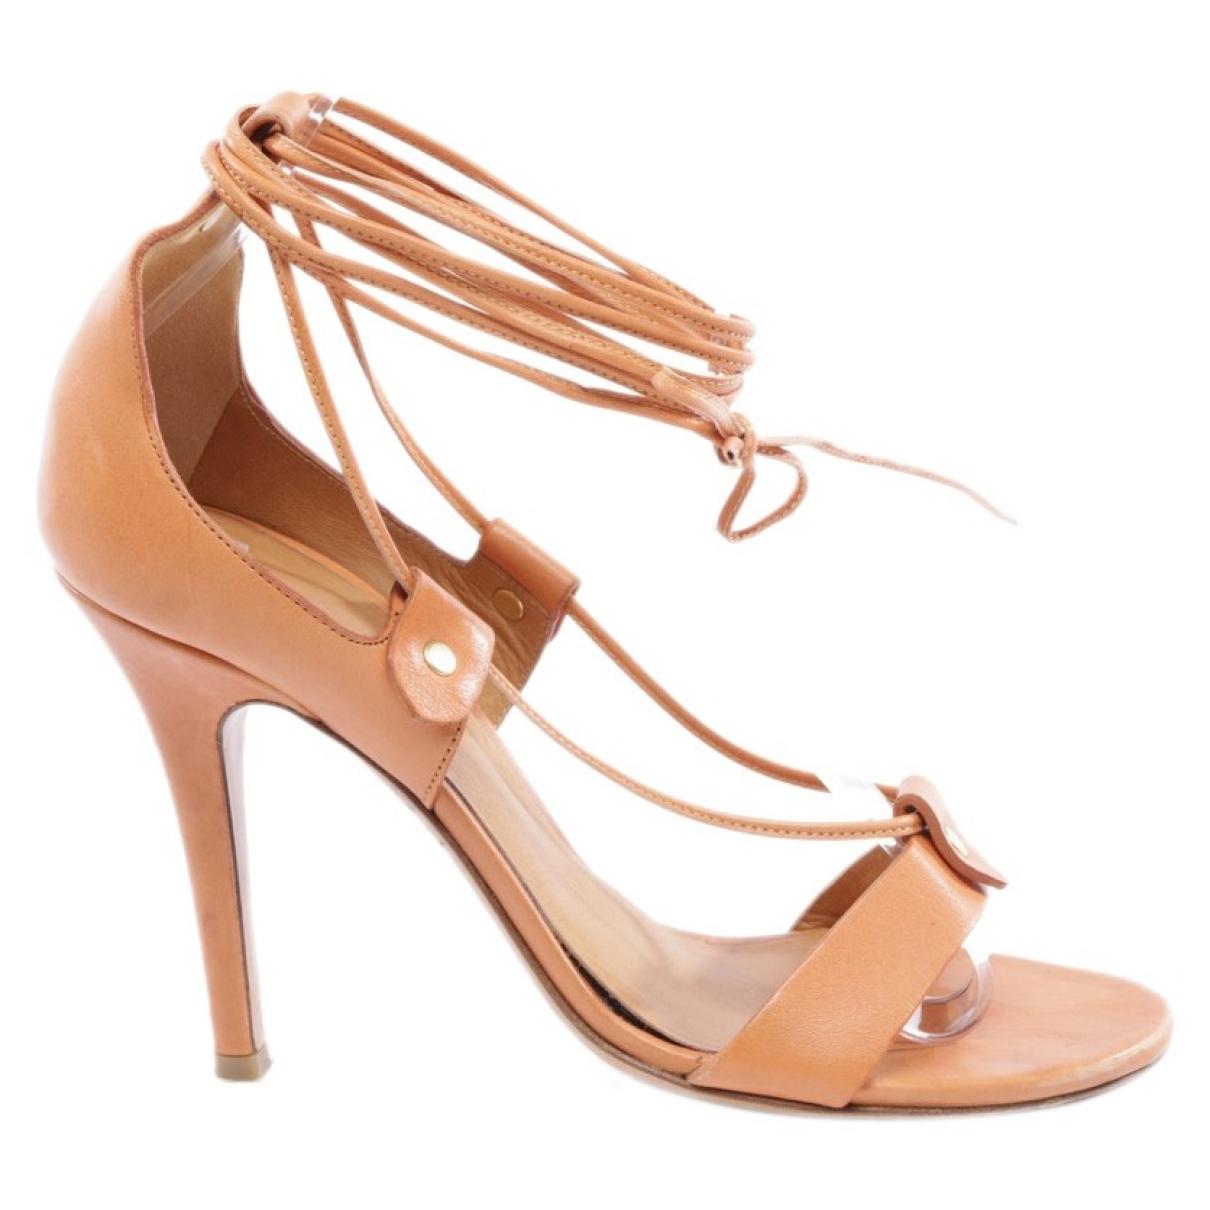 Isabel Marant - Sandales   pour femme en cuir - orange